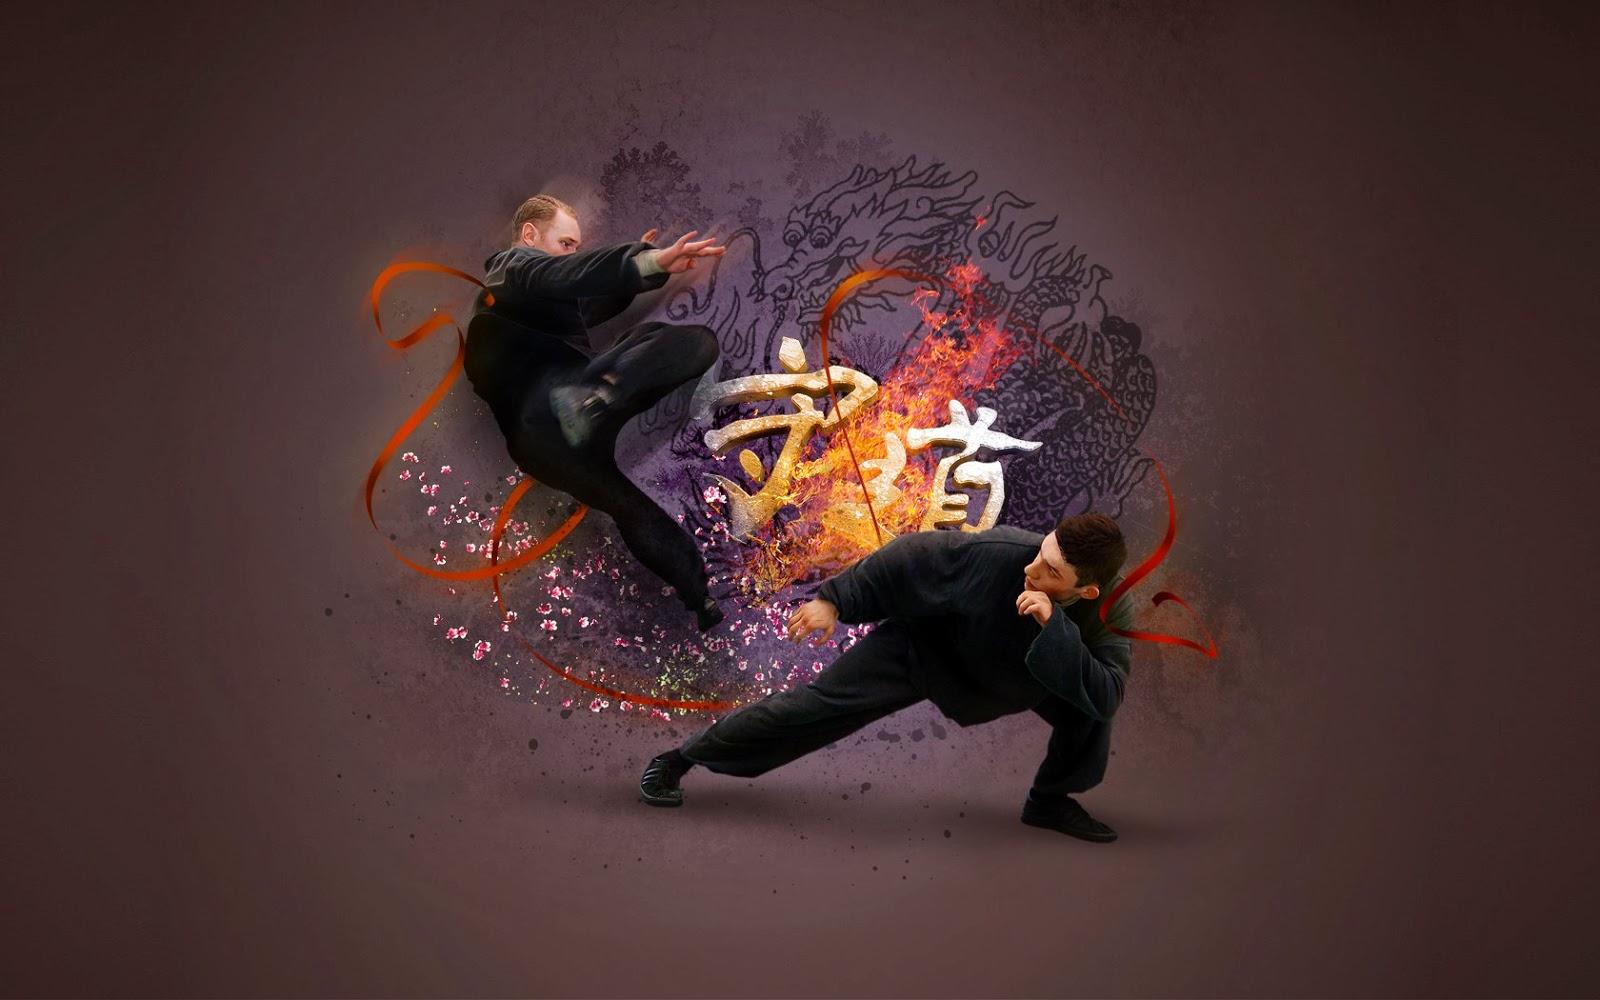 Martial Arts HD Wallpapers HD Wallpapers 360 1600x1000